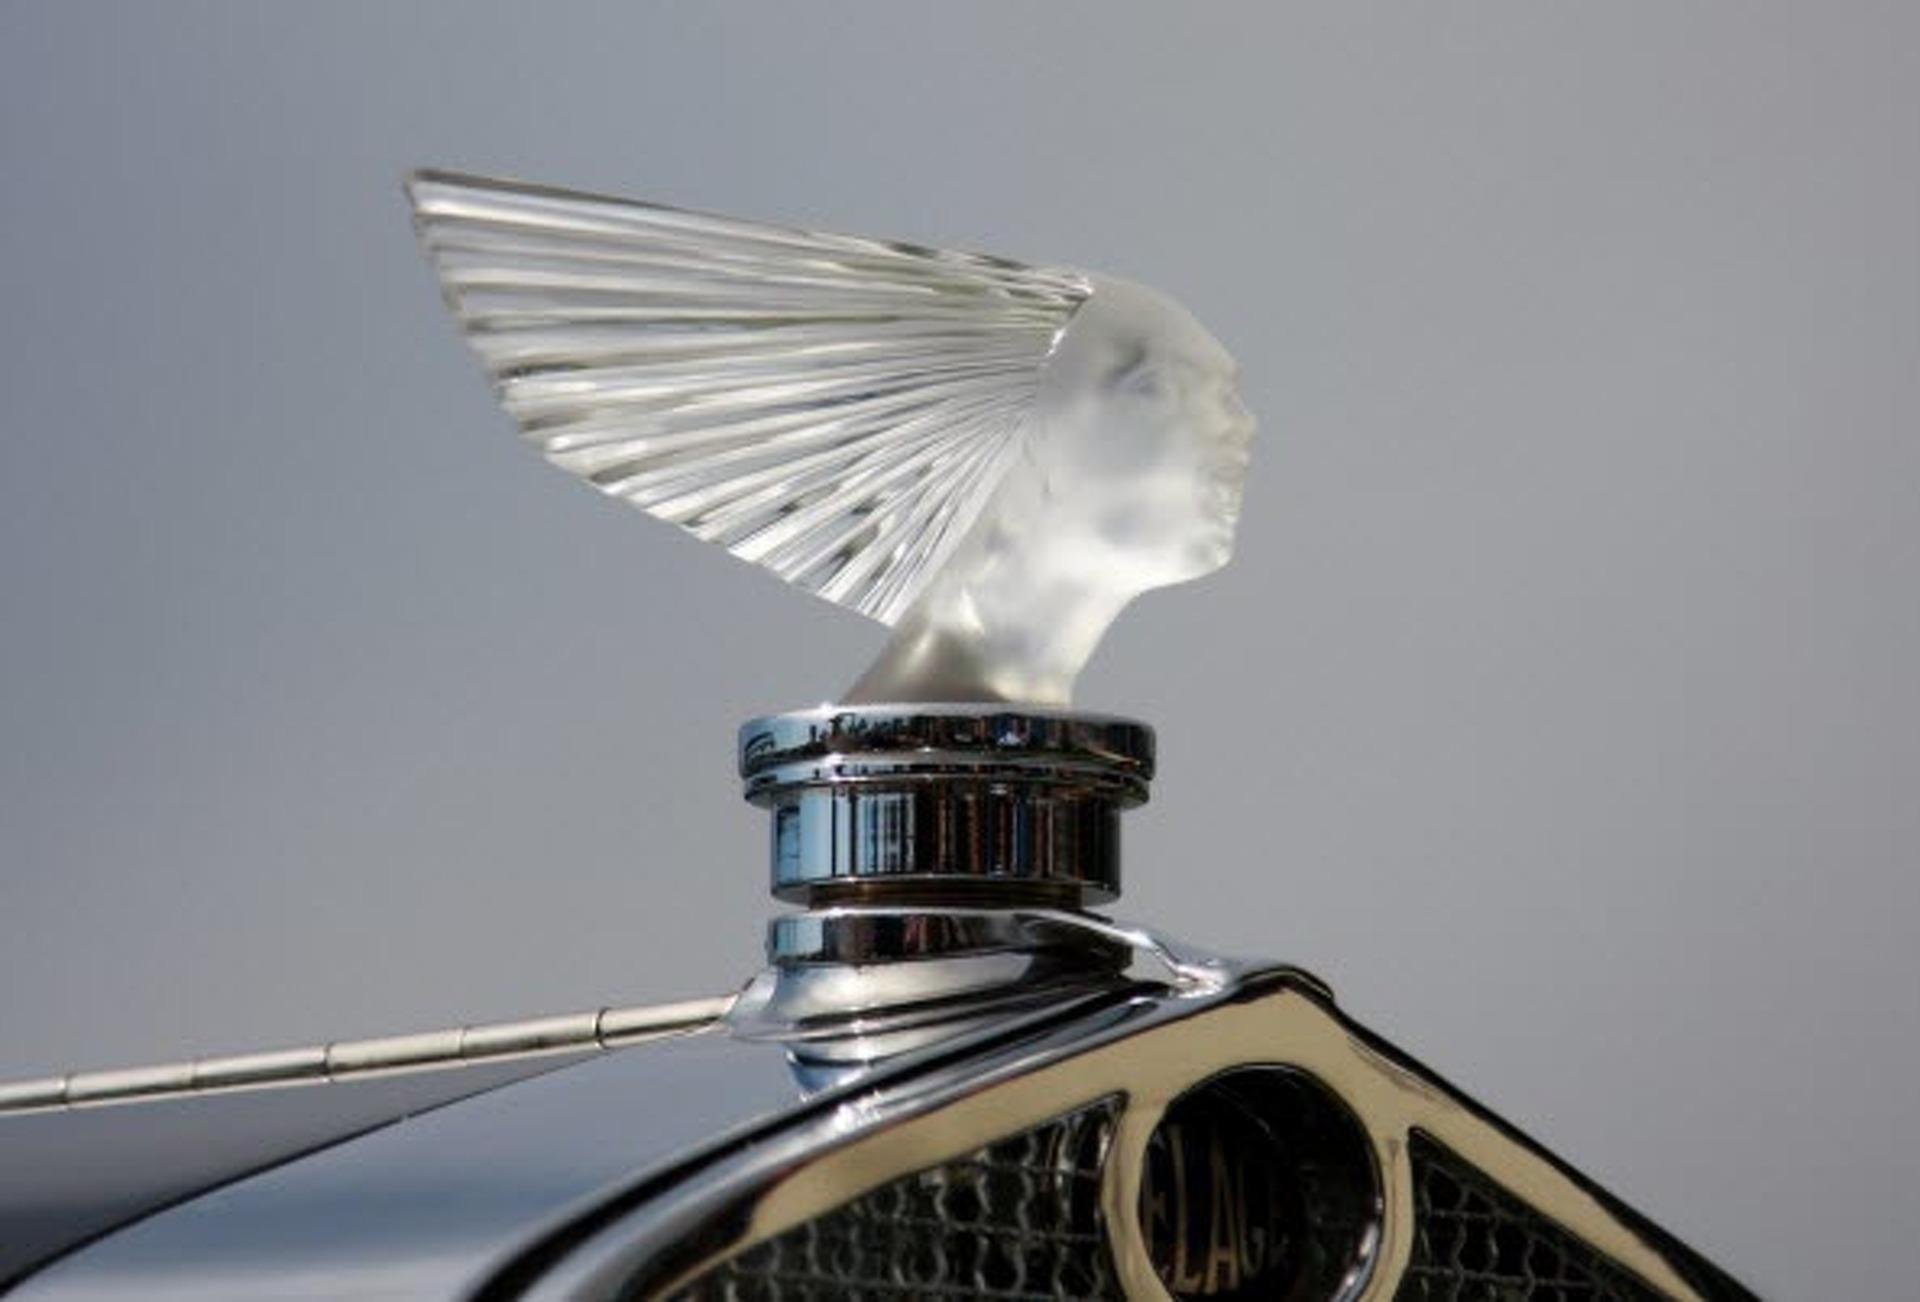 Art in Motion: The World's Most Elegant Radiator Mascots